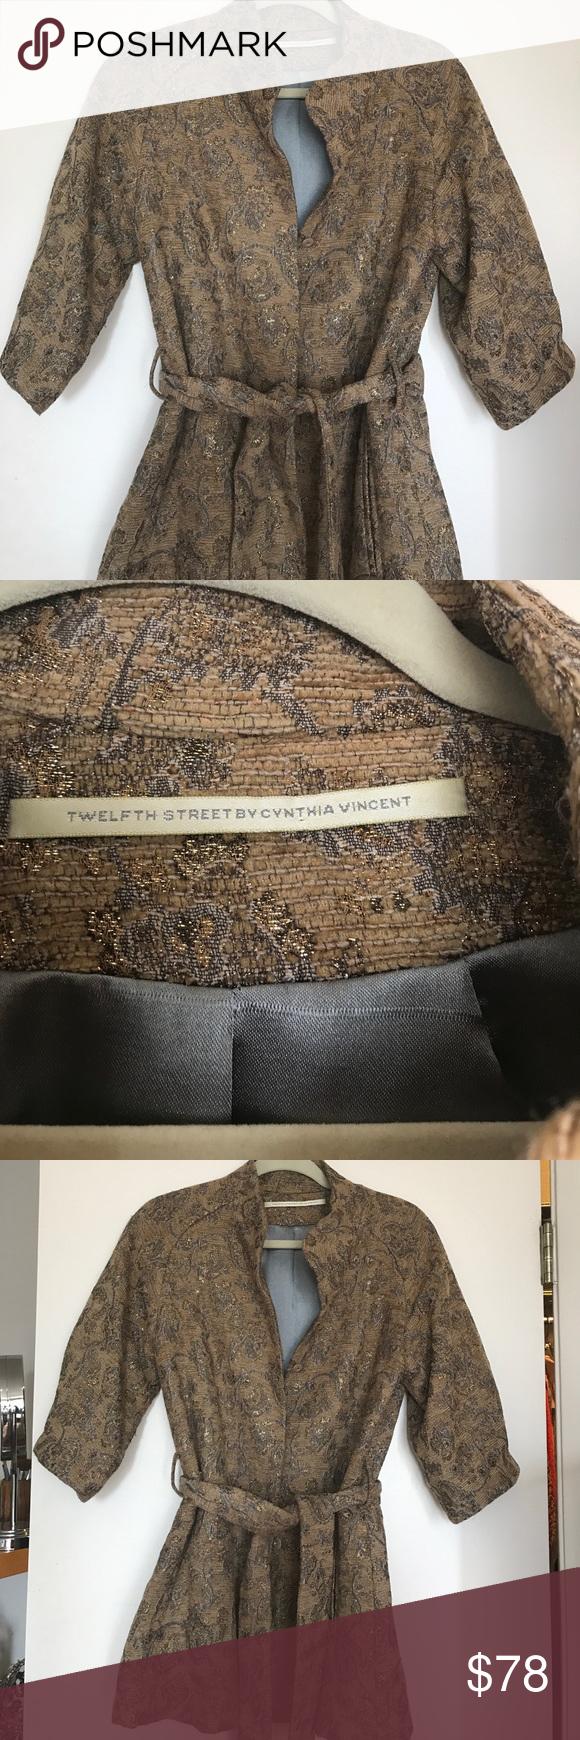 b49763891d21b3 Twelfth street Cynthia Vincent brocade jacket